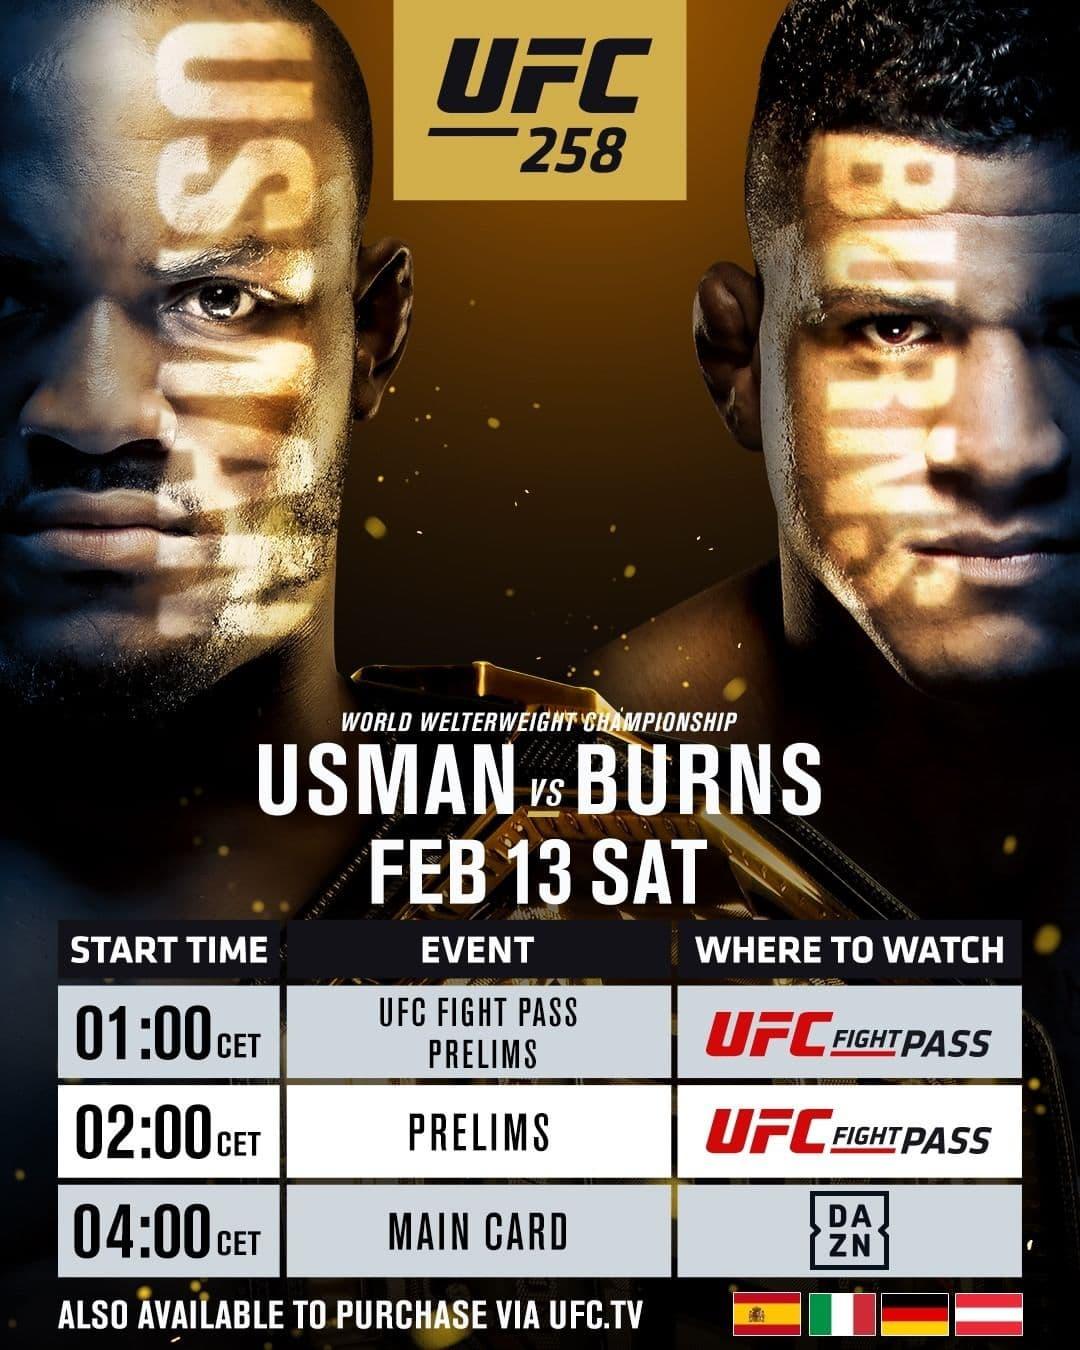 UFC 258 - Usman vs Burns